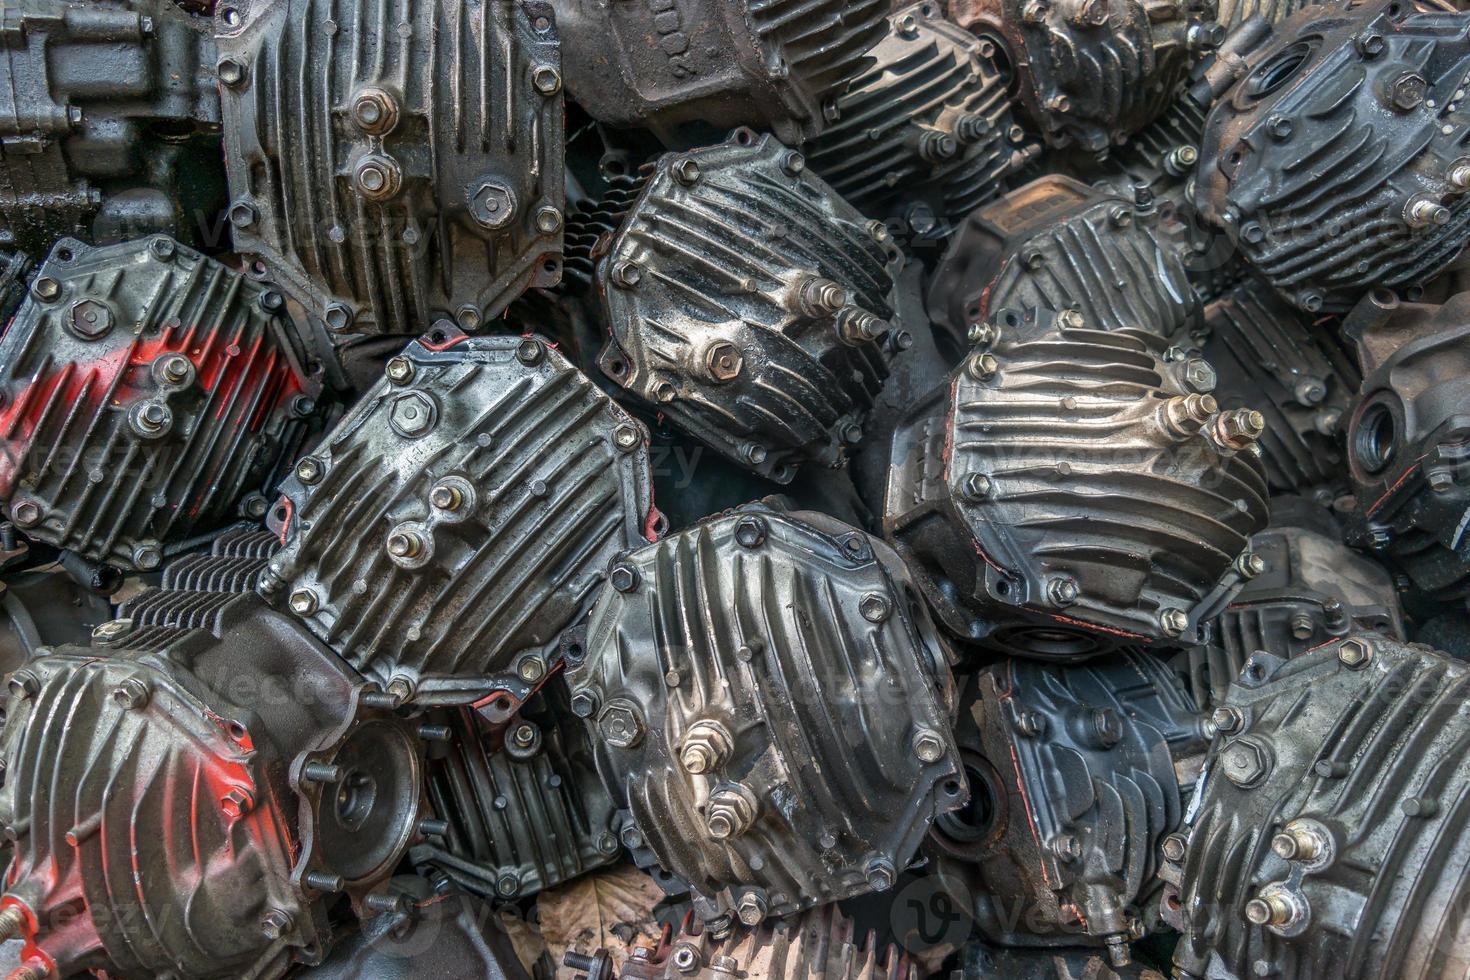 motores de moto foto